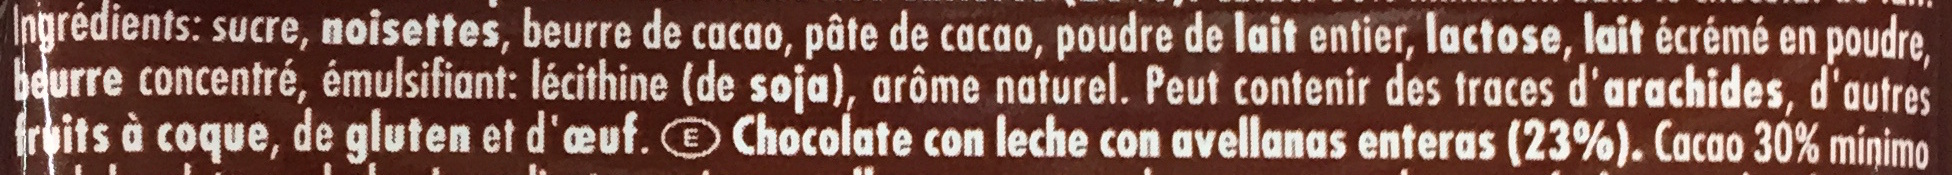 Whole Hazelnuts - Ingredienser - fr